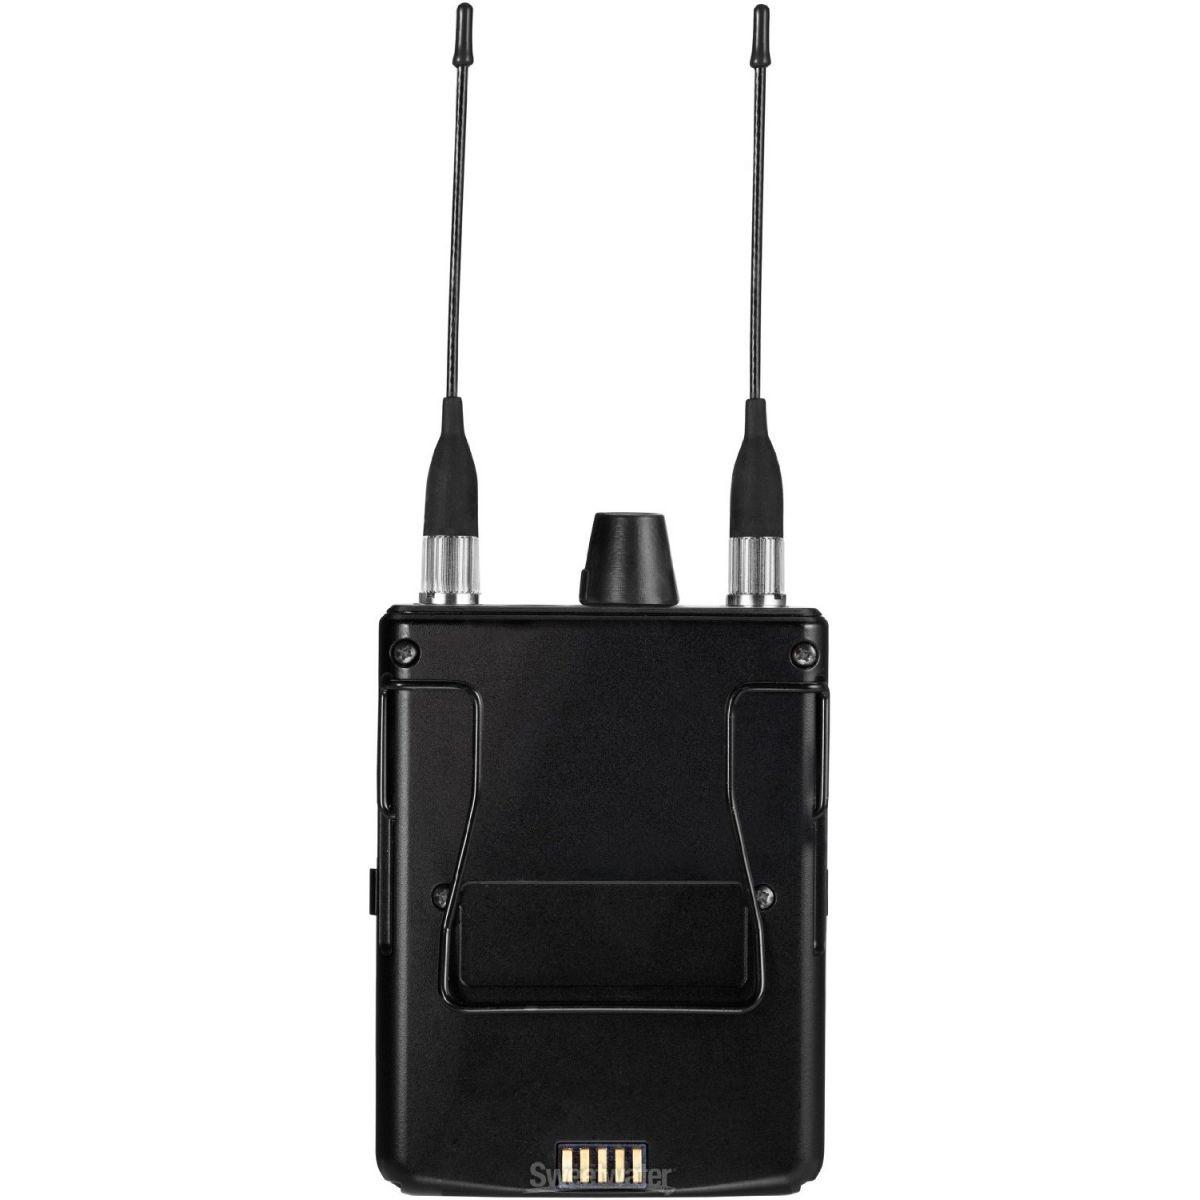 Shure PSM1000 P10T Sistema Monitoramento Sem Fio